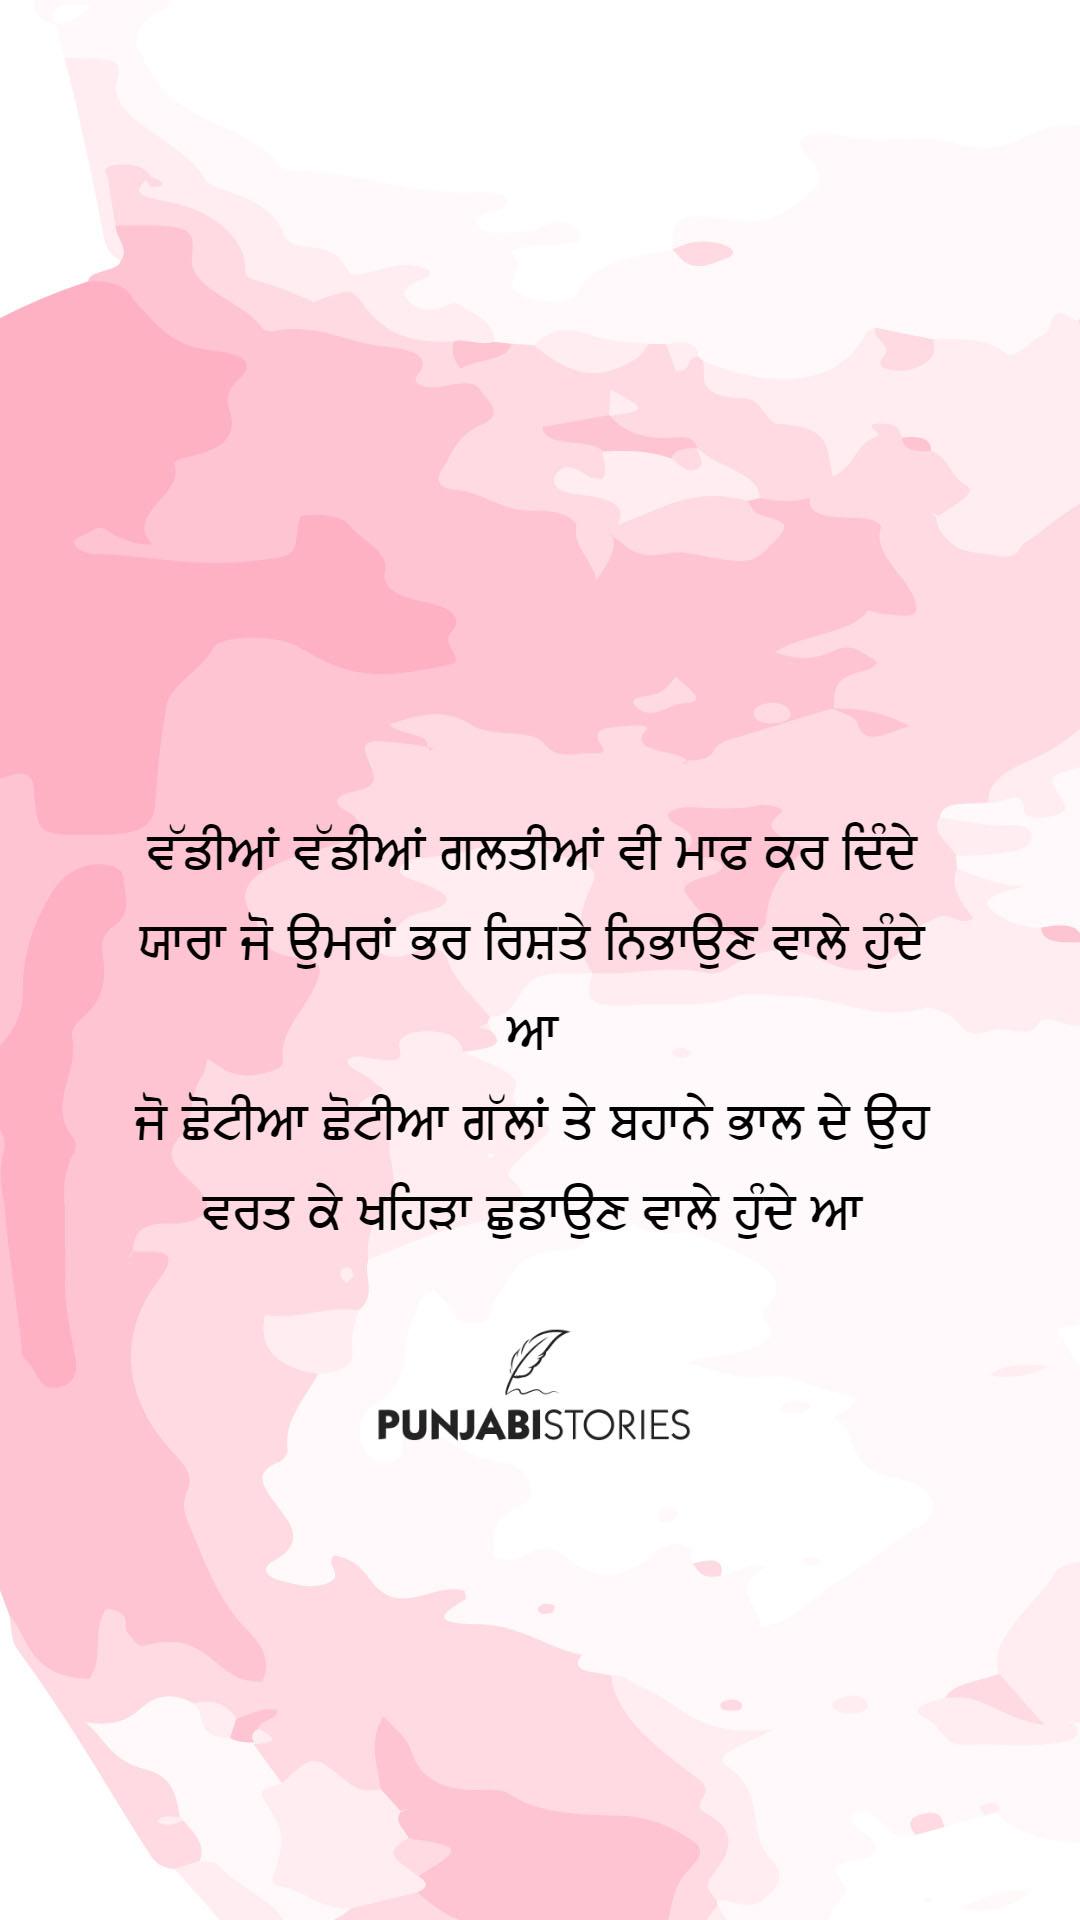 whatsapp status punjabi, yaari quotes punjabi